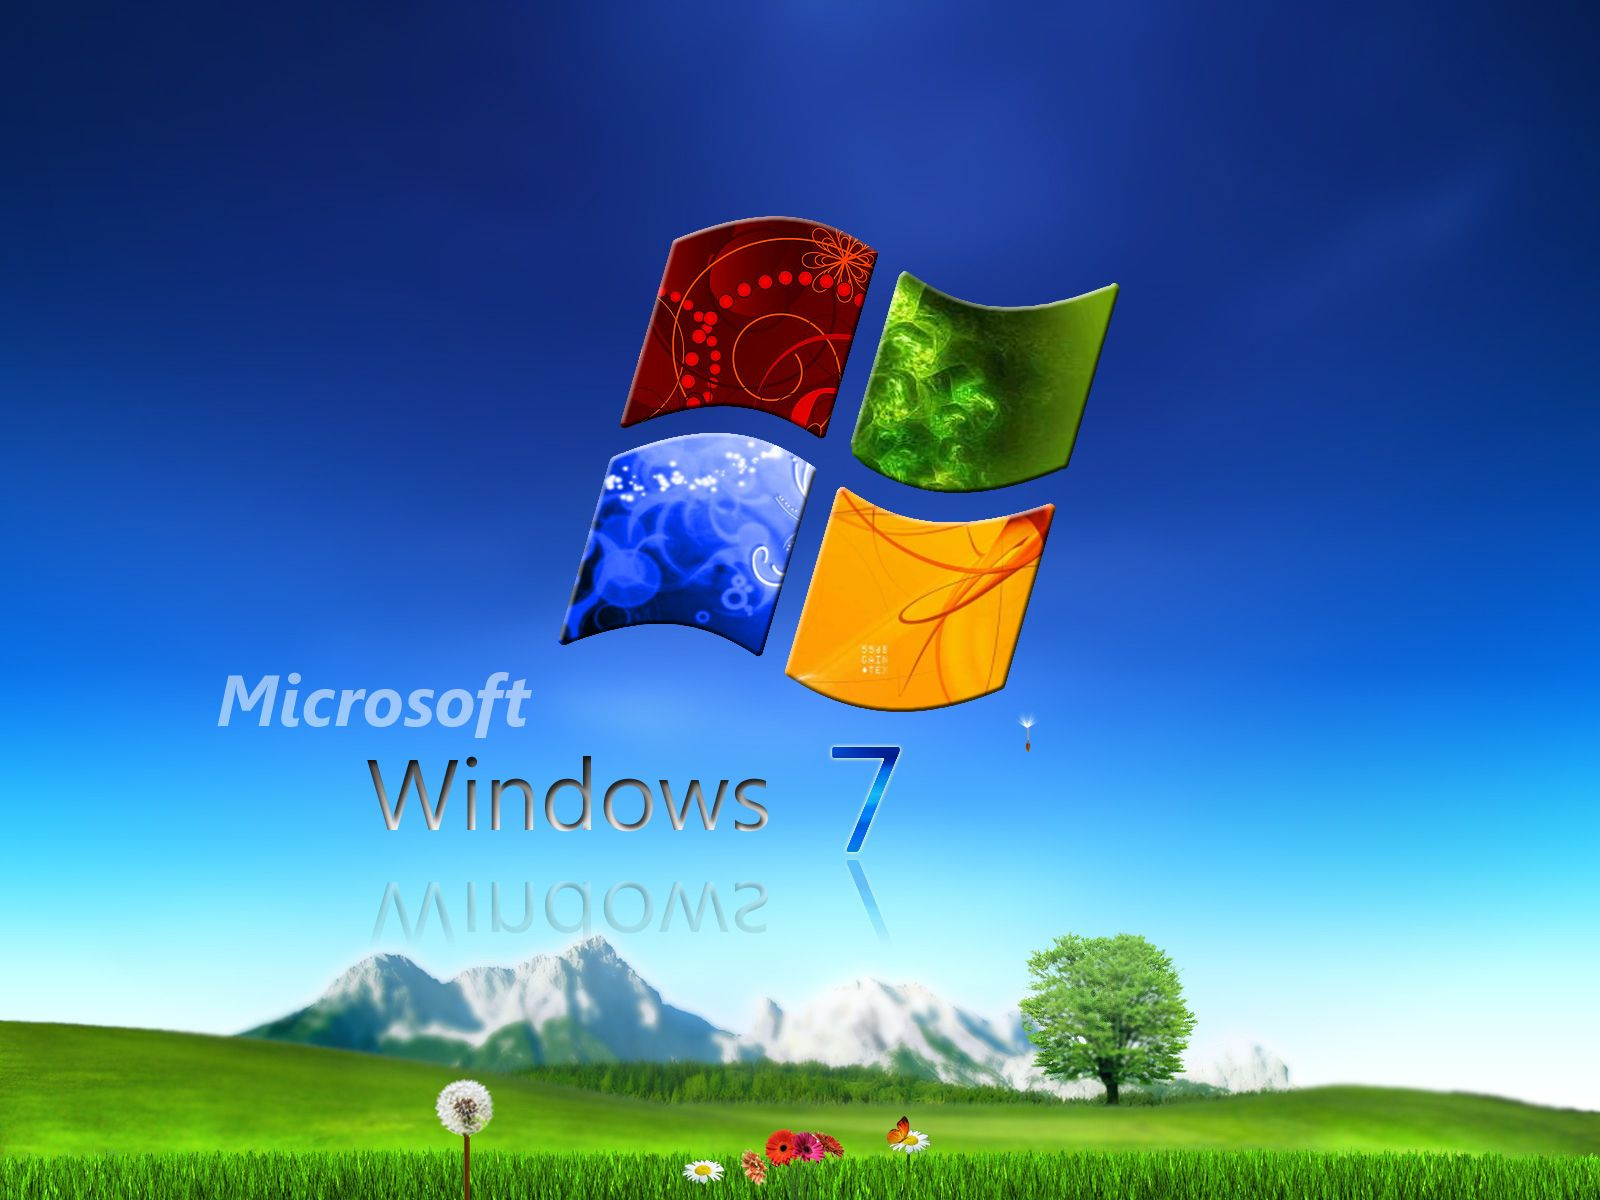 Hd Wallpaper For Windows 7